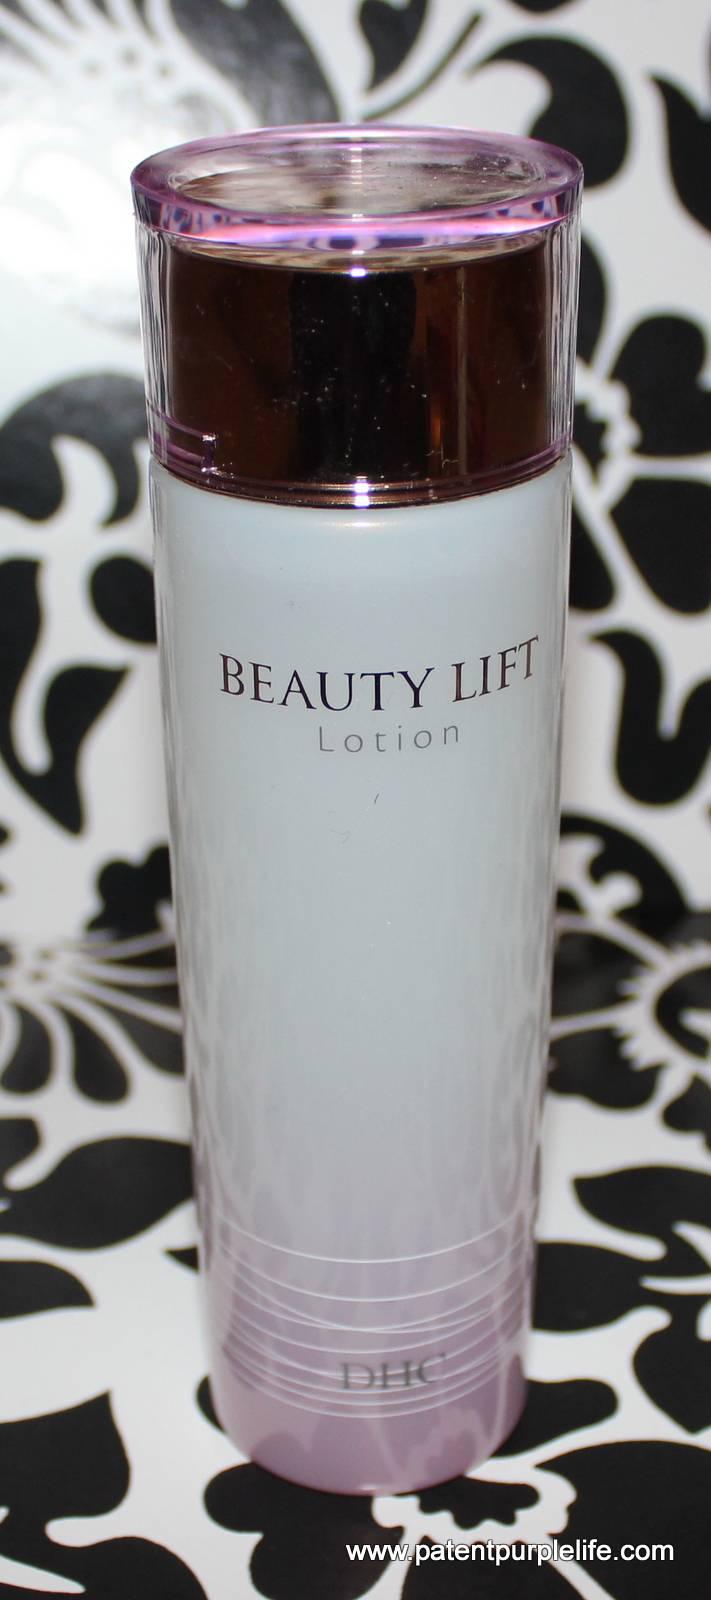 DHC Beauty Lift Lotion